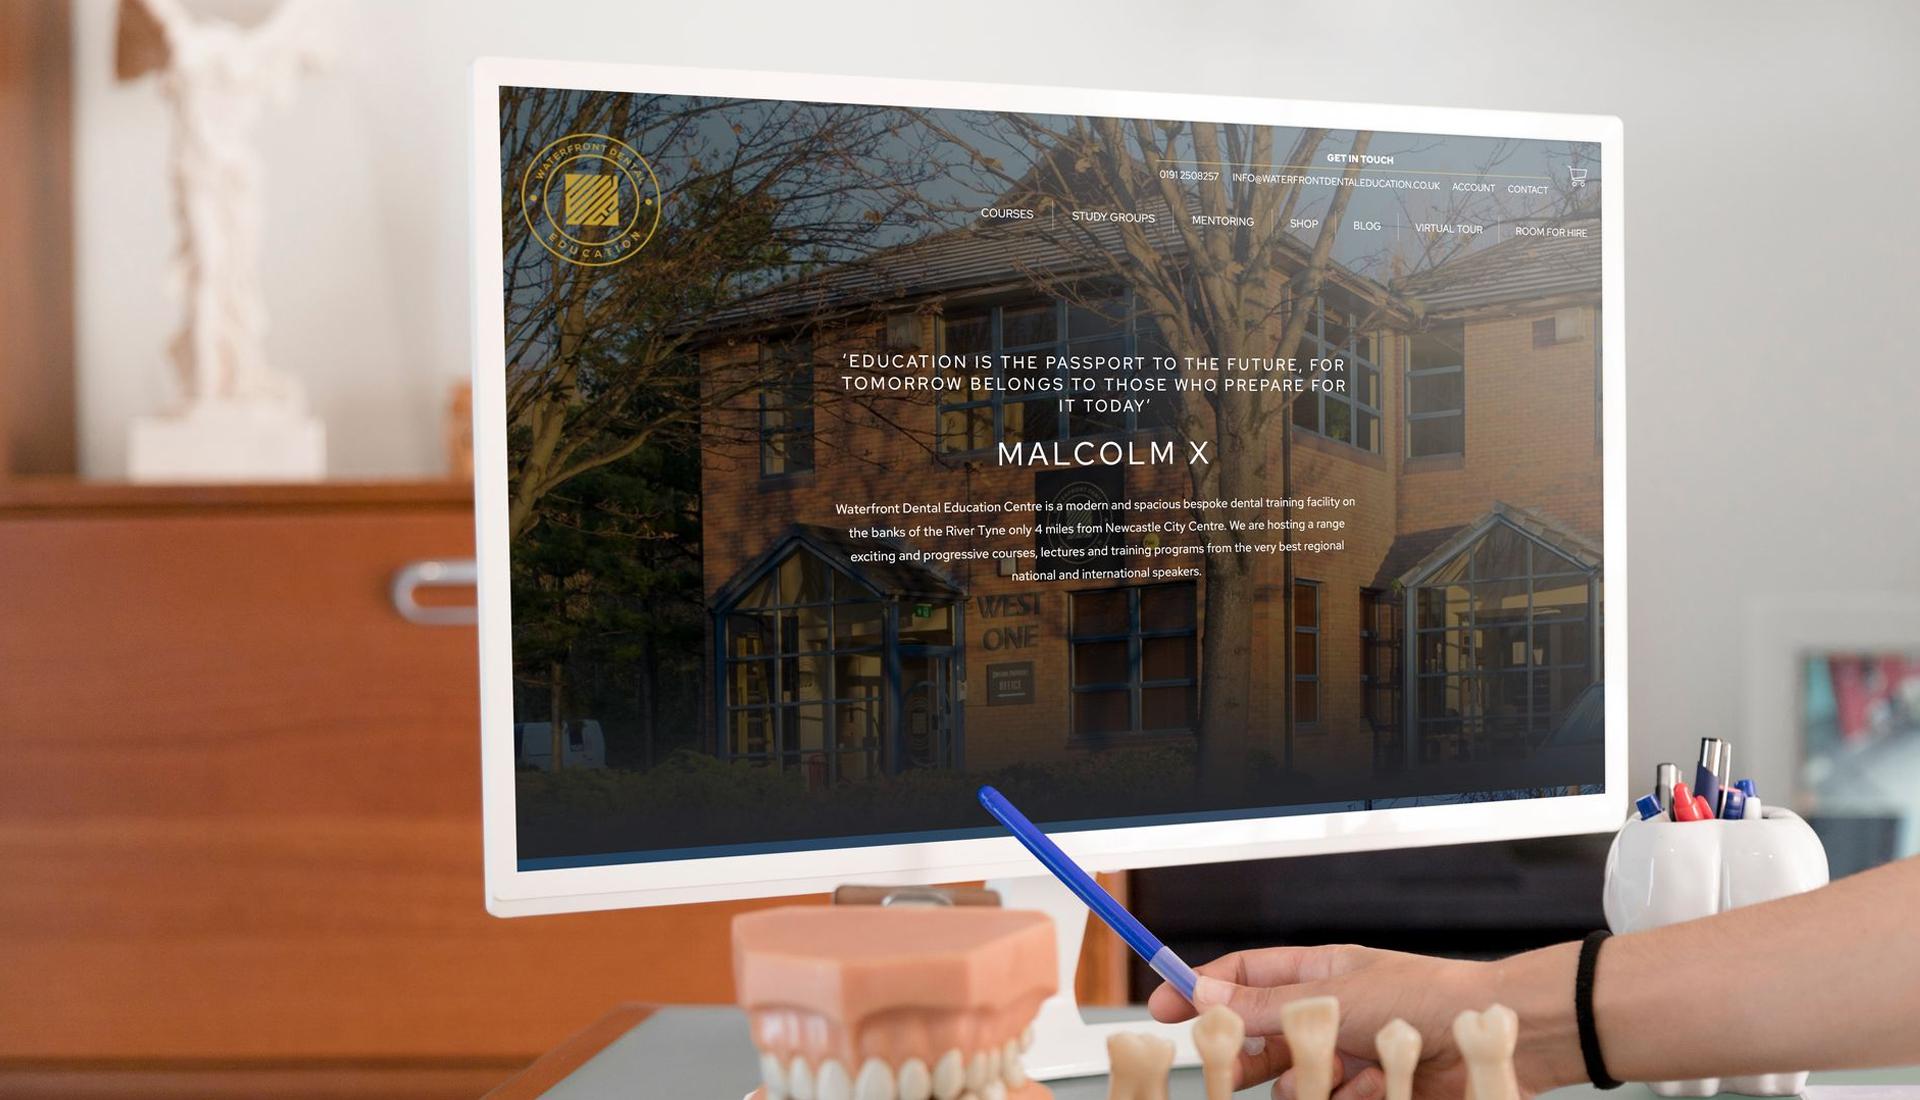 Waterfront Dental Education's website displayed on a desktop computer